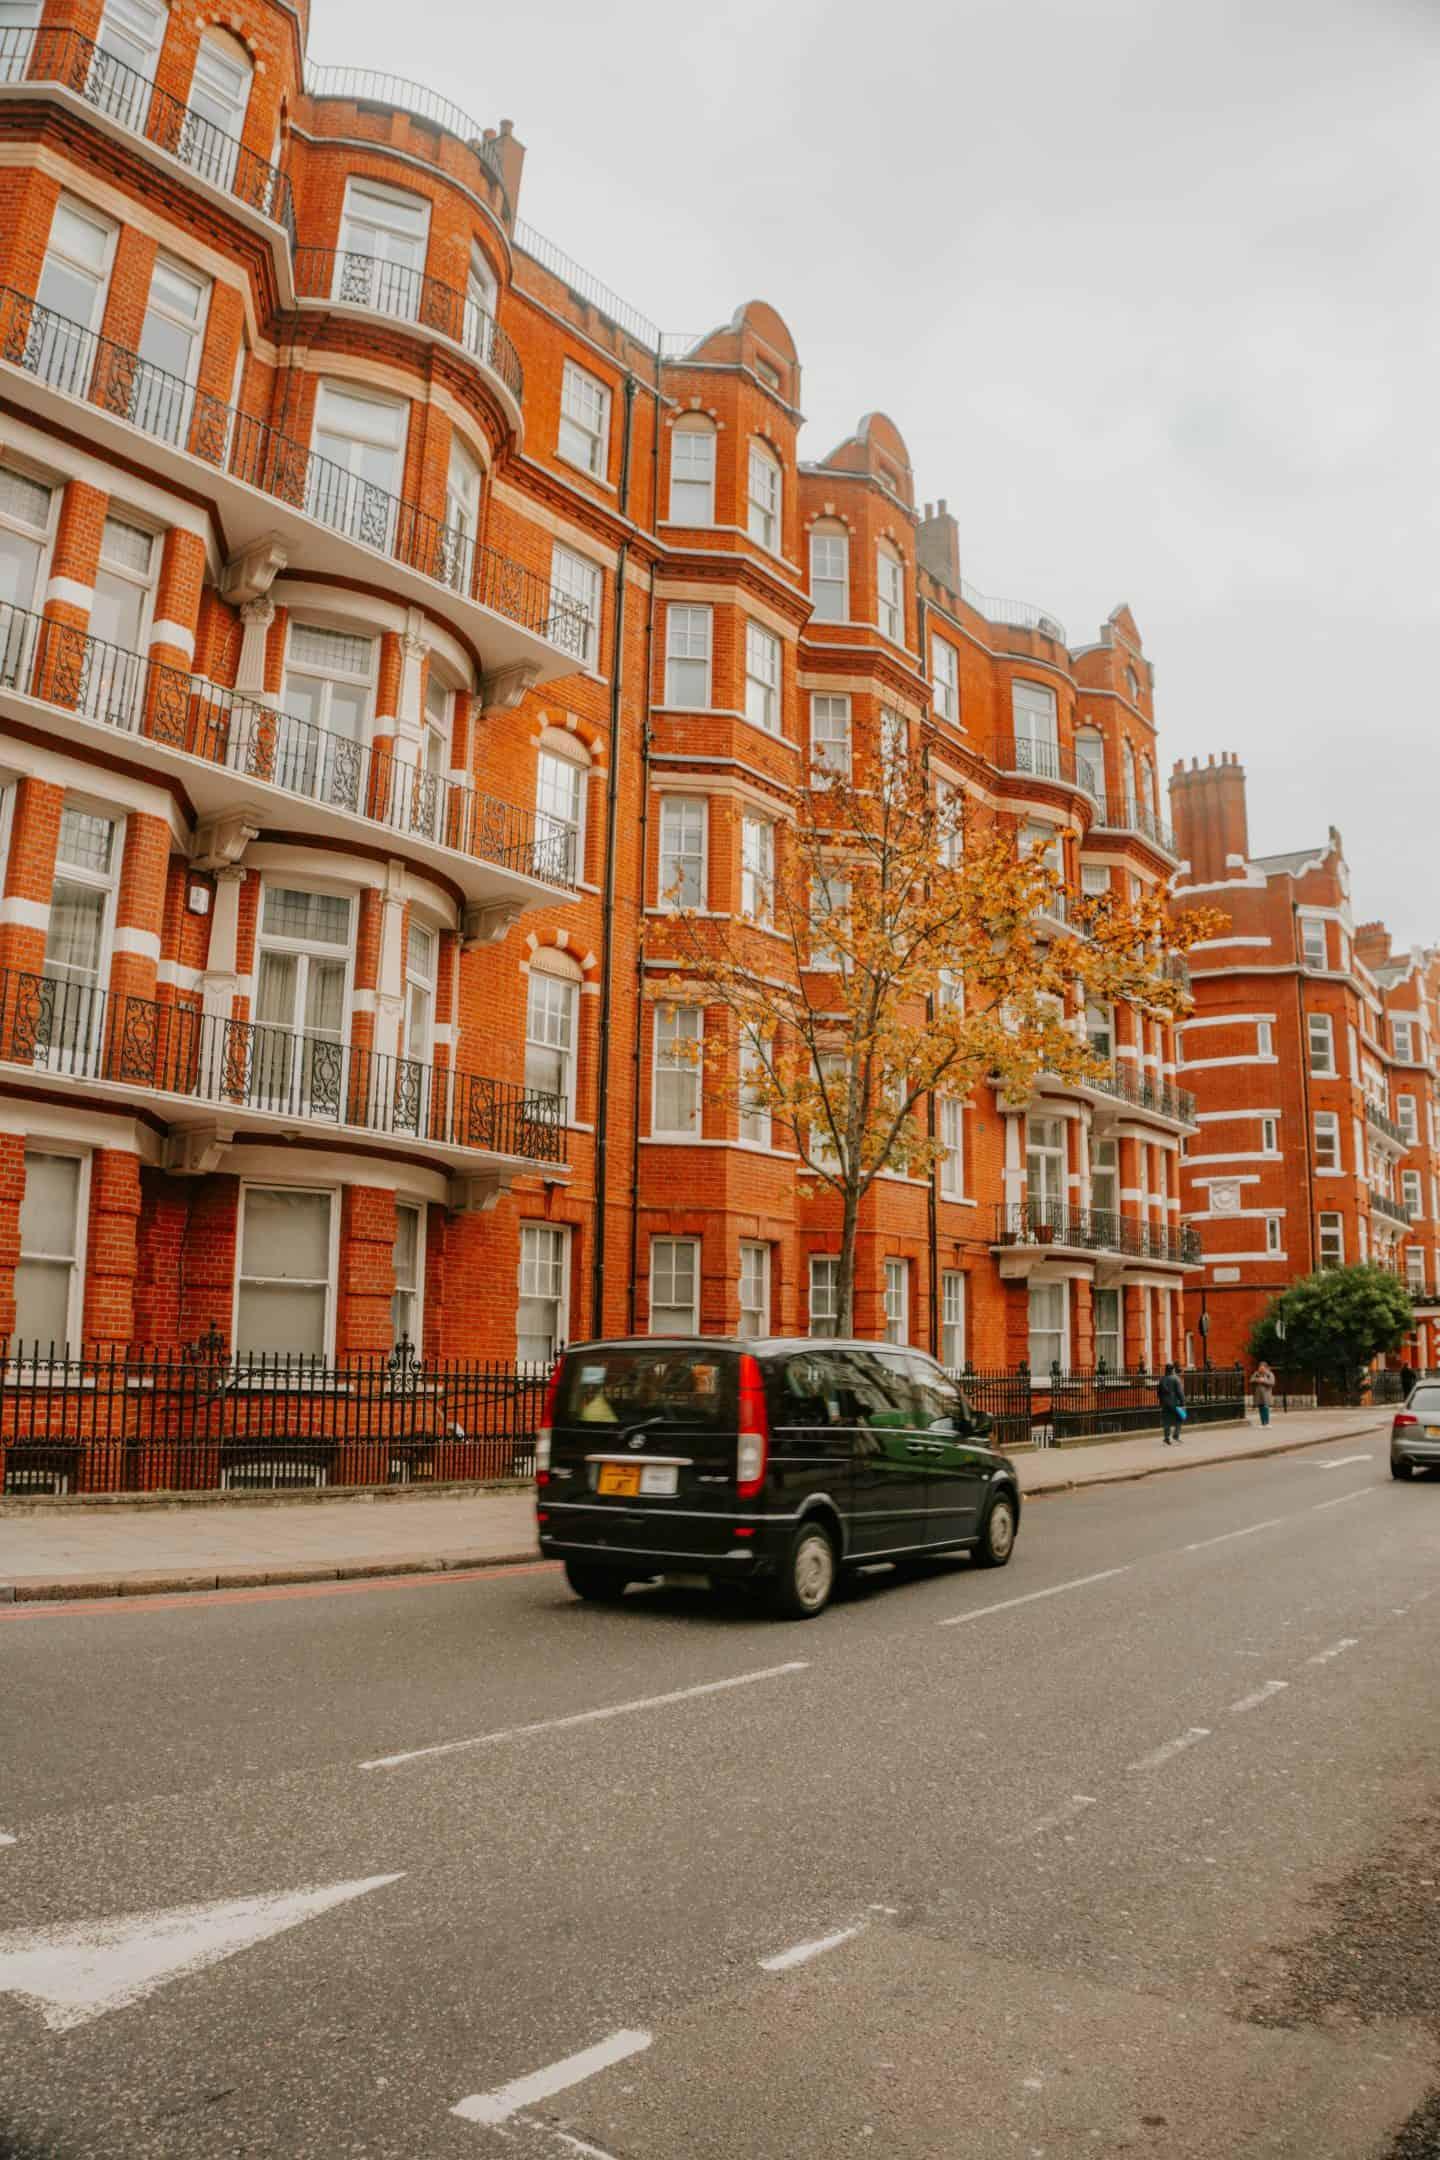 Fulham London